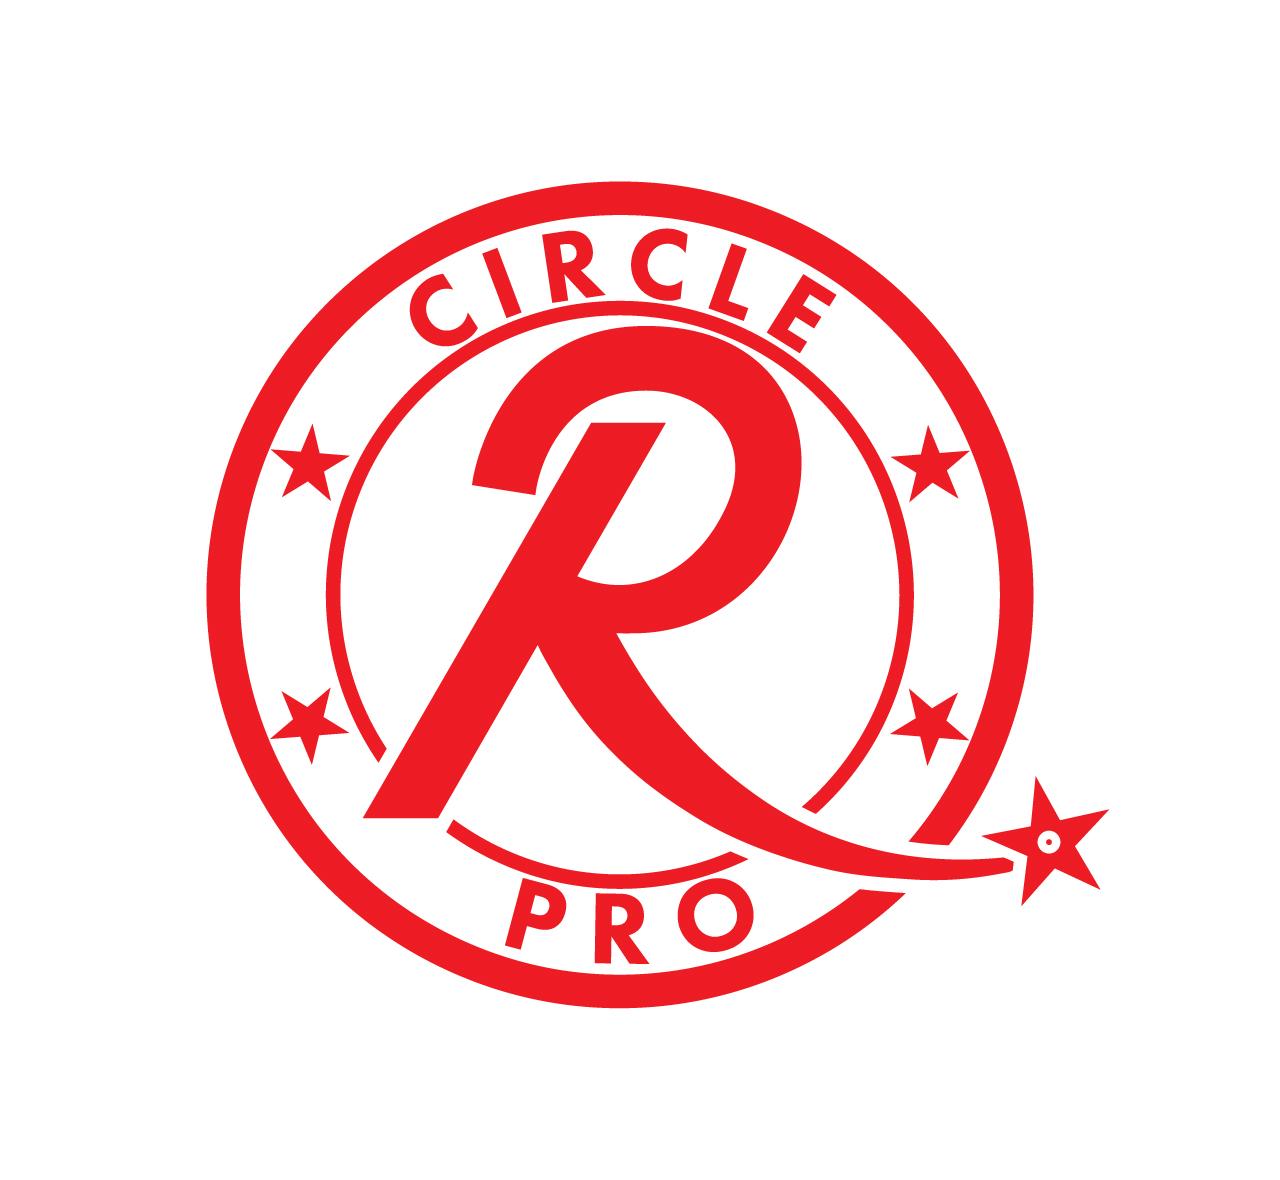 R Logos Red Circle - 12.000 vector logos